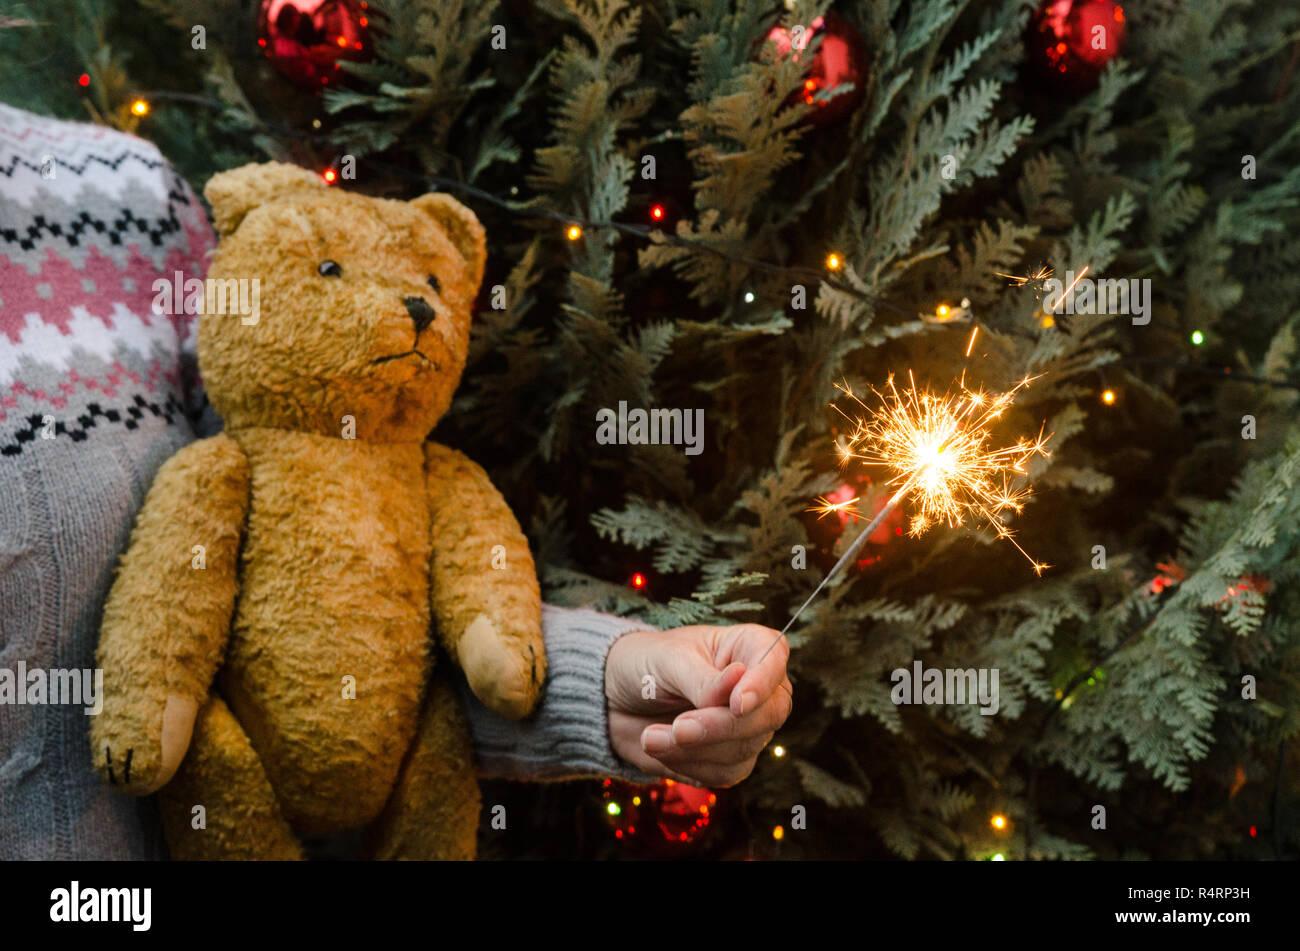 d7e866f8fe Christmas scene - woman holding teddy bear and sparkler before christmas  tree